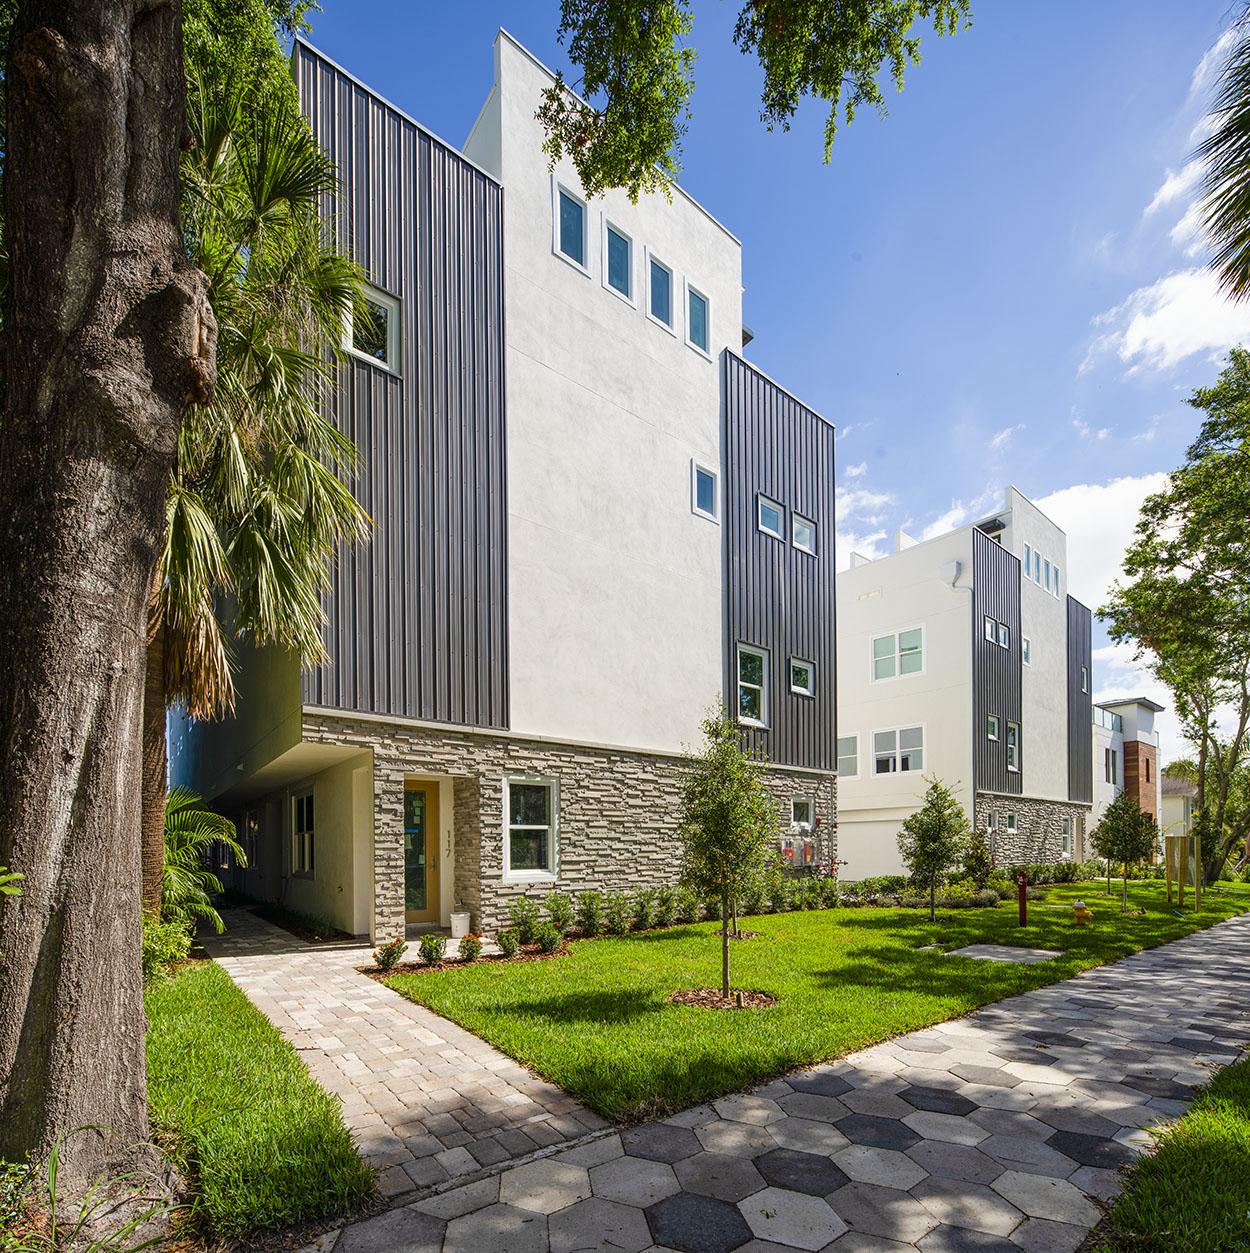 5th Avenue Townhome | St. Petersburg, FL